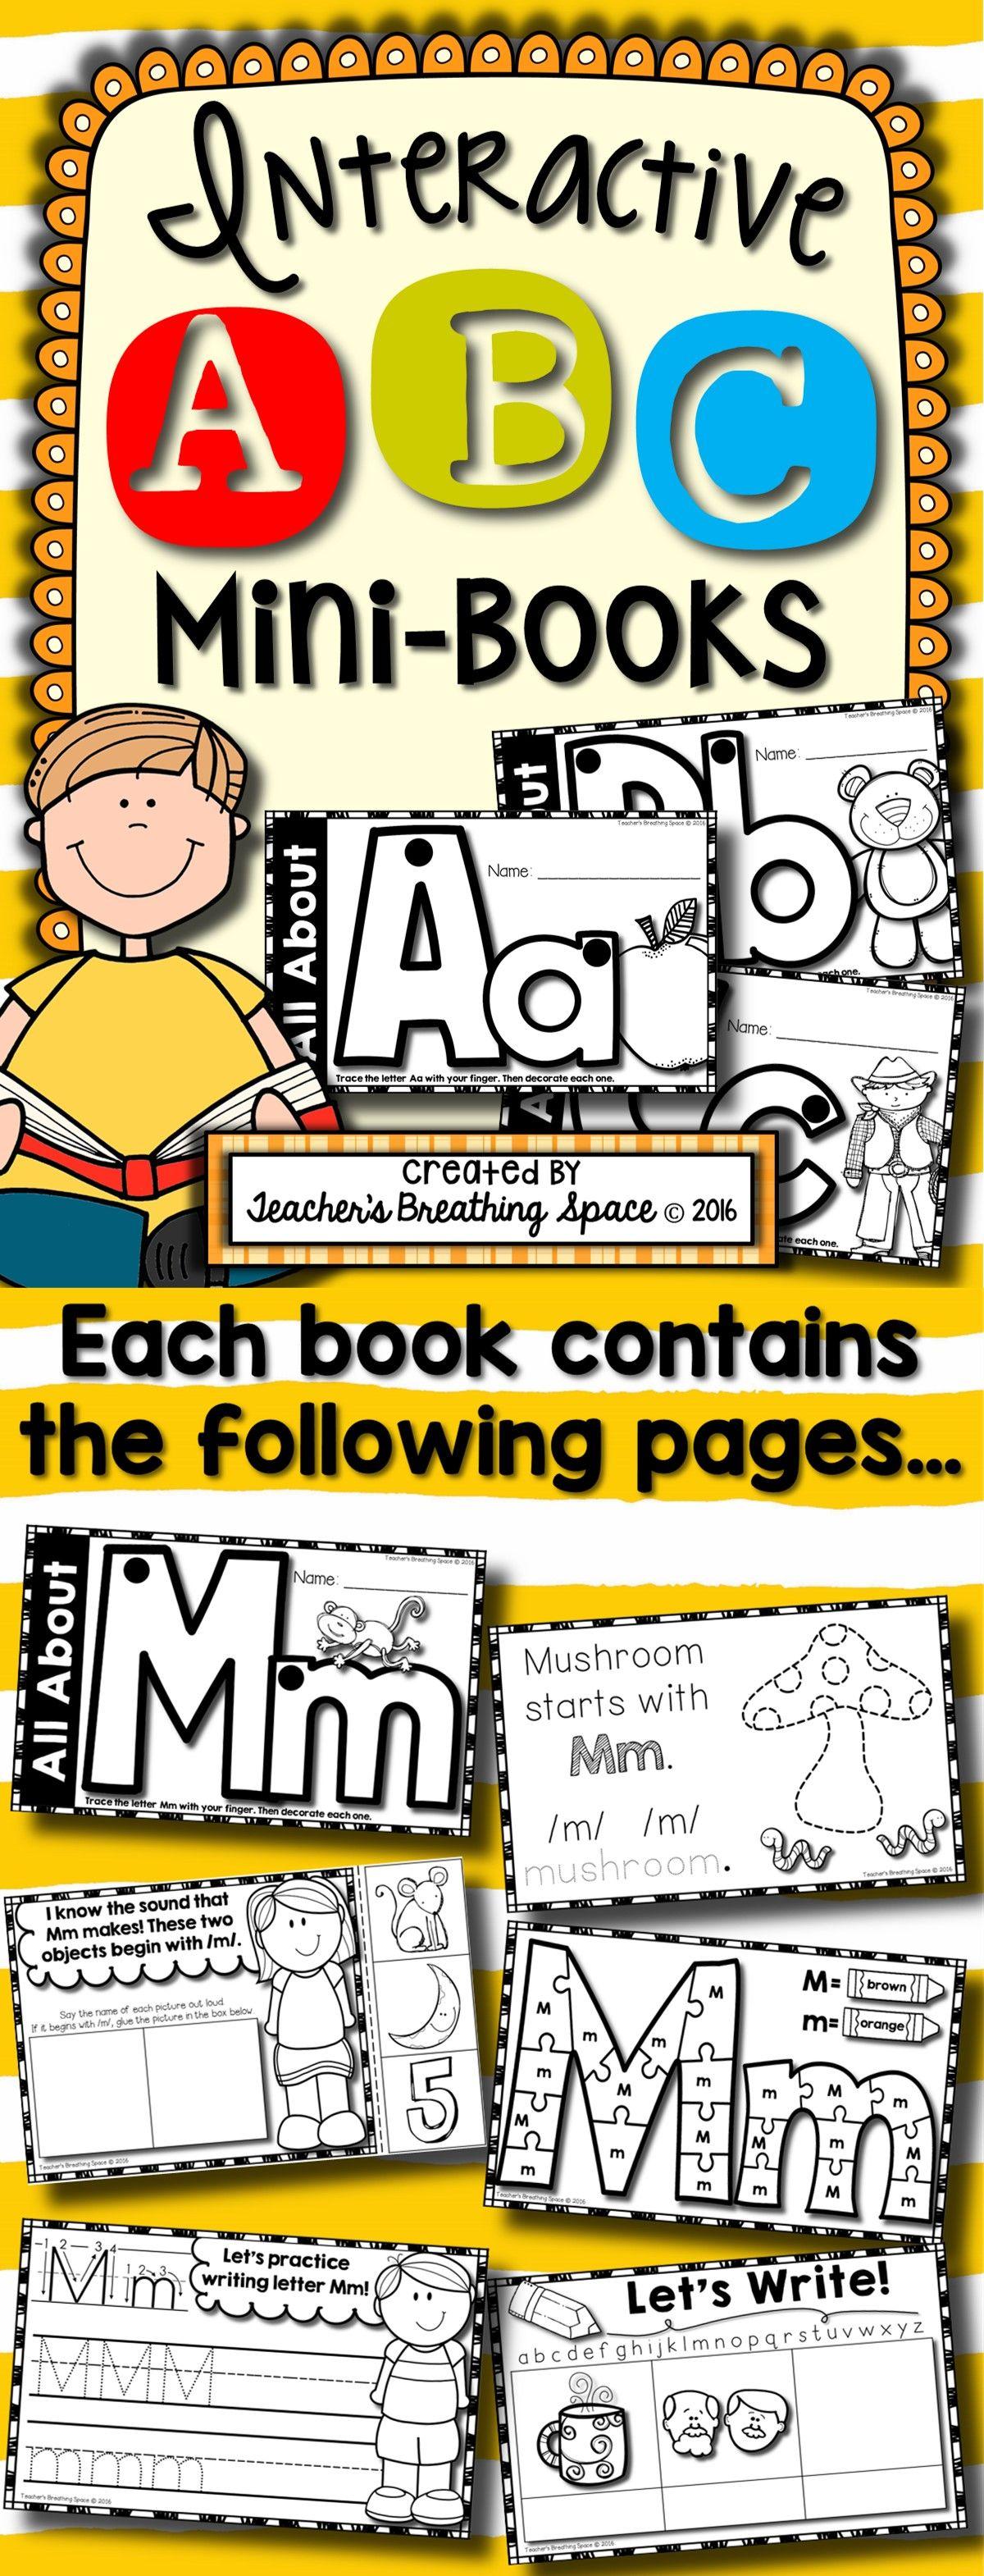 Alphabet Books Interactive Abc Mini Books For Every